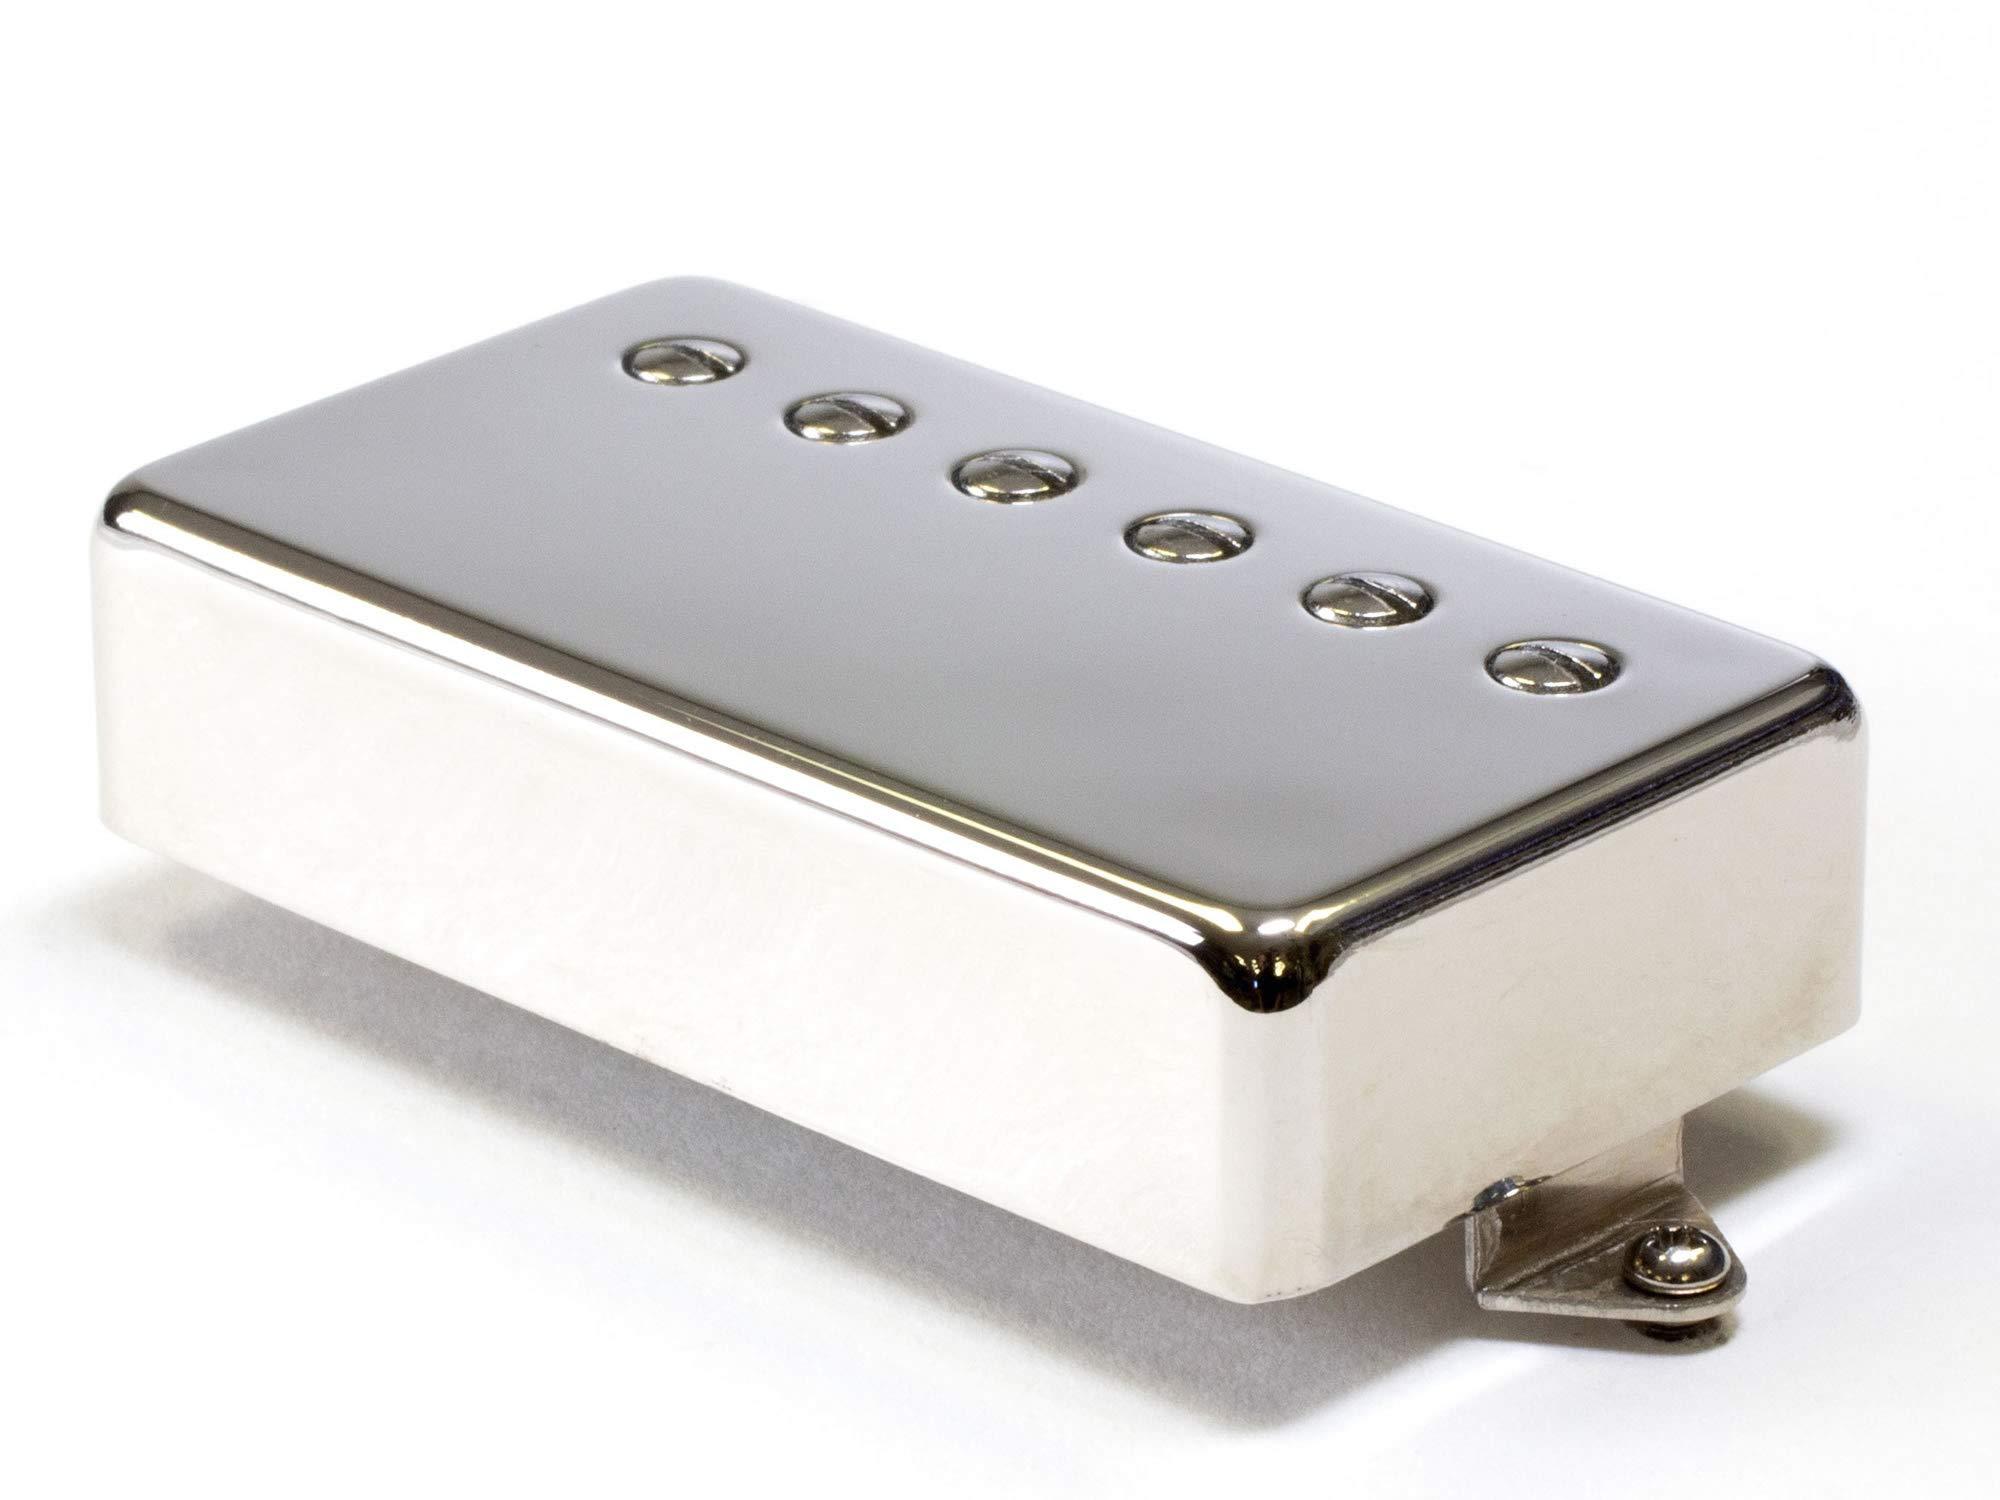 Suhr Guitars Thornbucker Pickup, Bridge 53mm, Nickel (Mirror-Finish) by ToneShaper